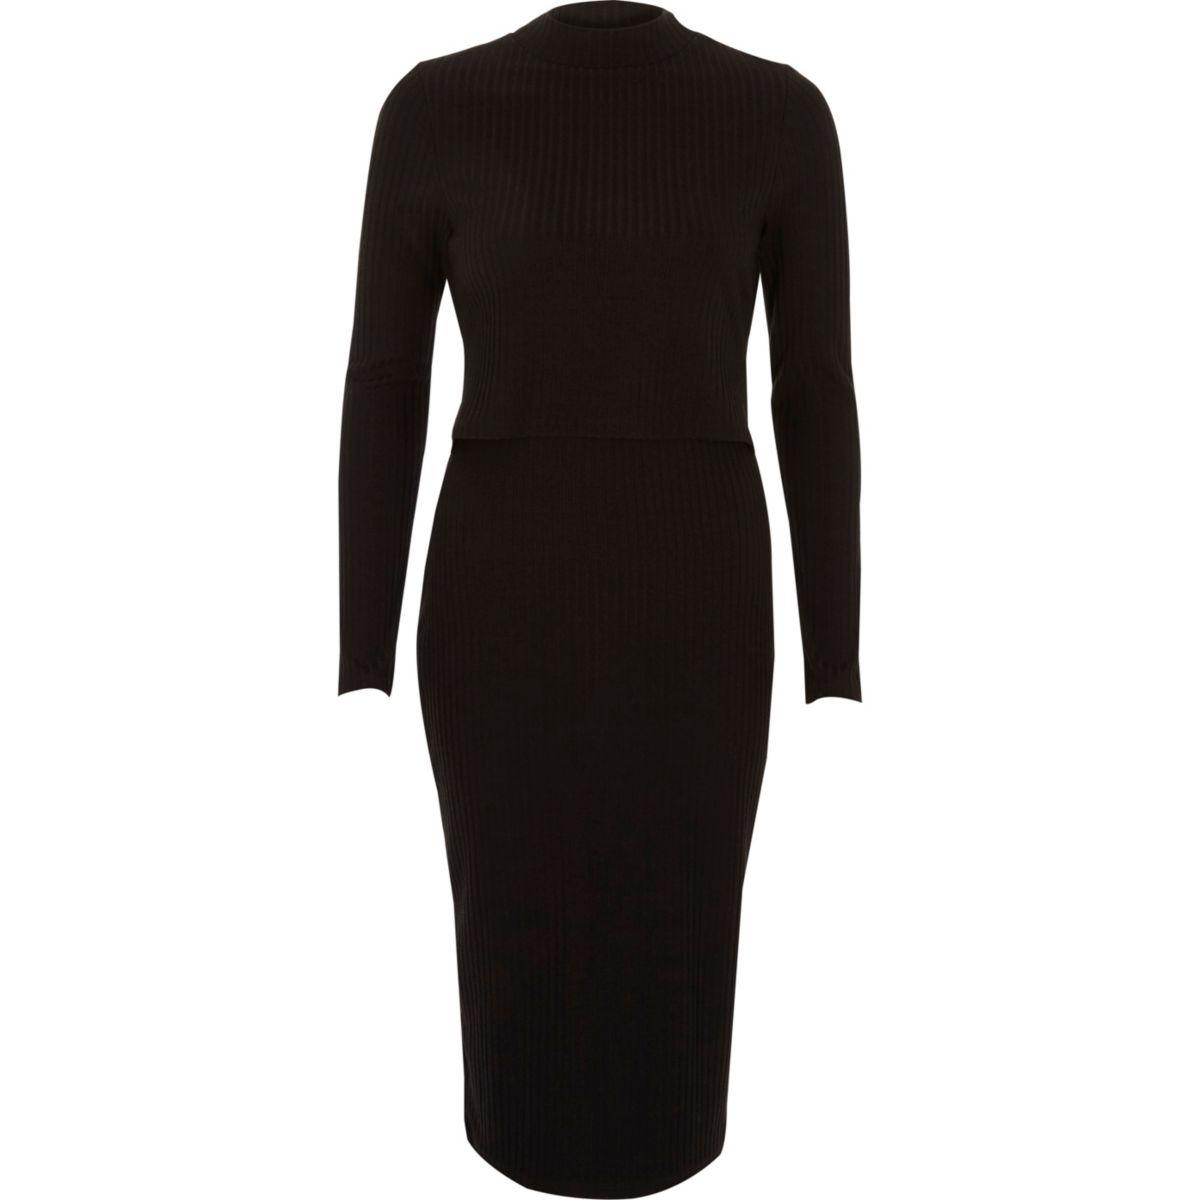 Zwarte geribbelde gelaagde midi-jurk met uitsnede op de rug